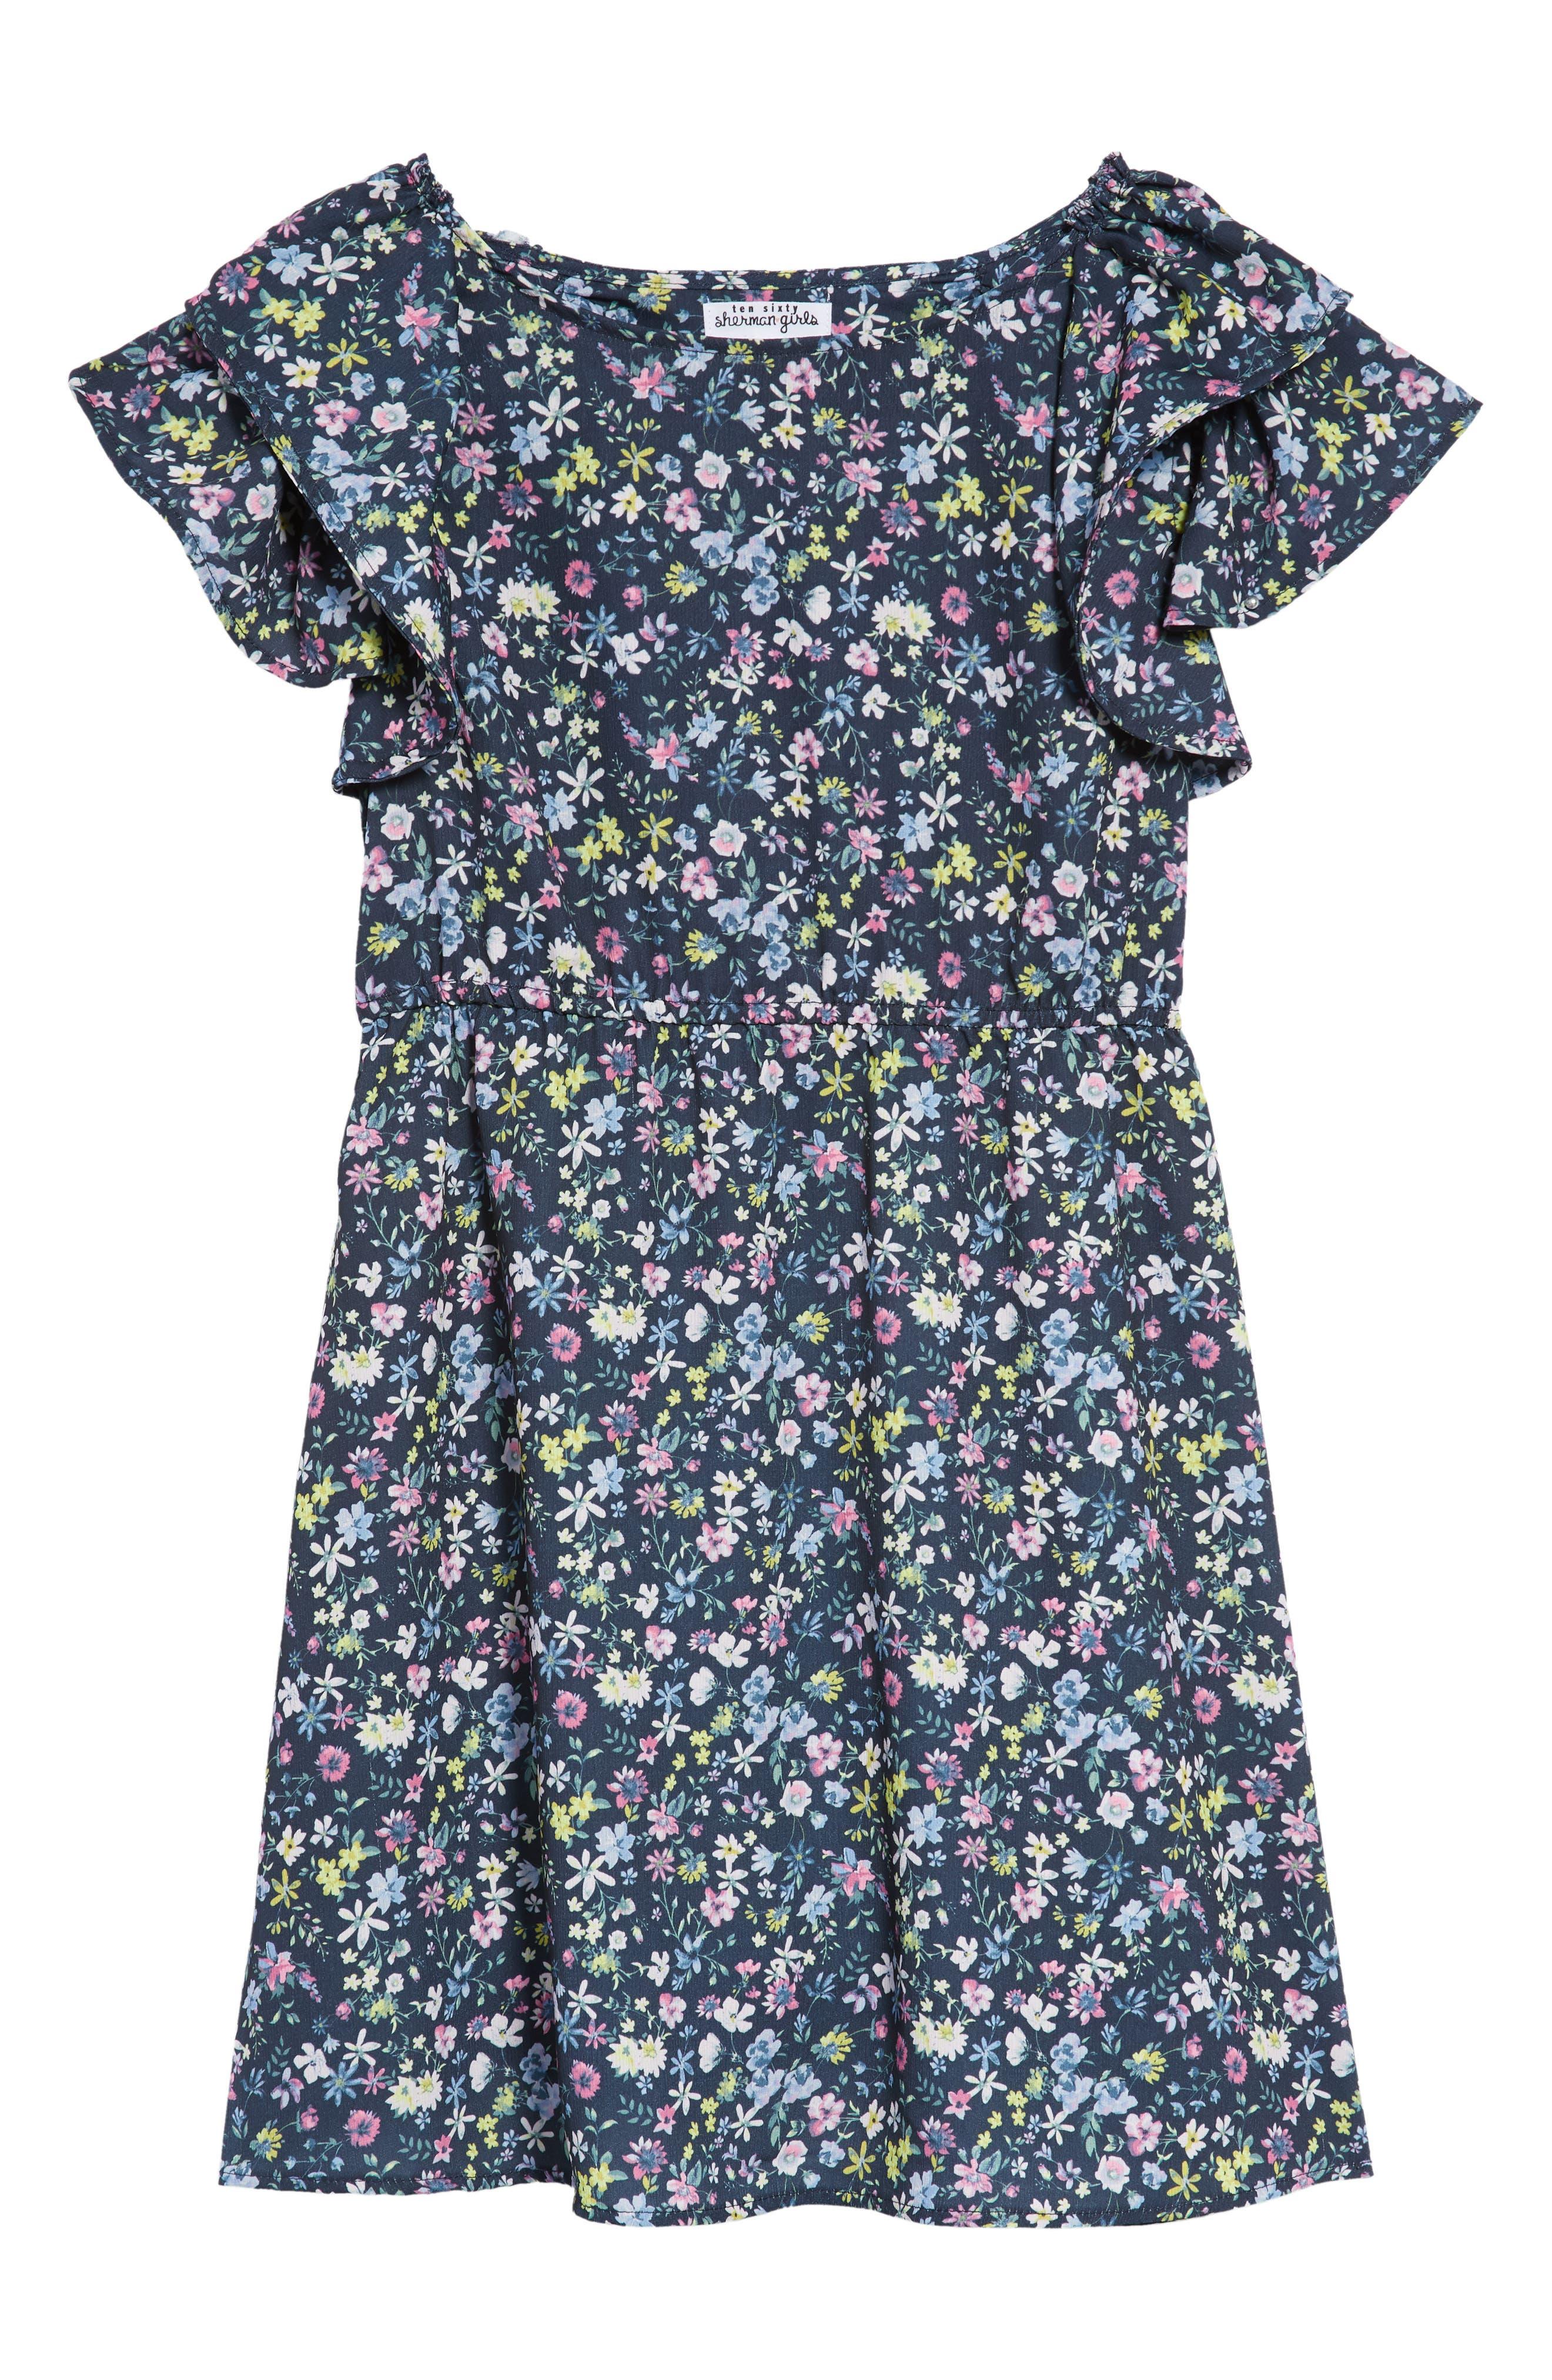 Ruffle Sleeve Floral Print Dress,                             Main thumbnail 1, color,                             Navy